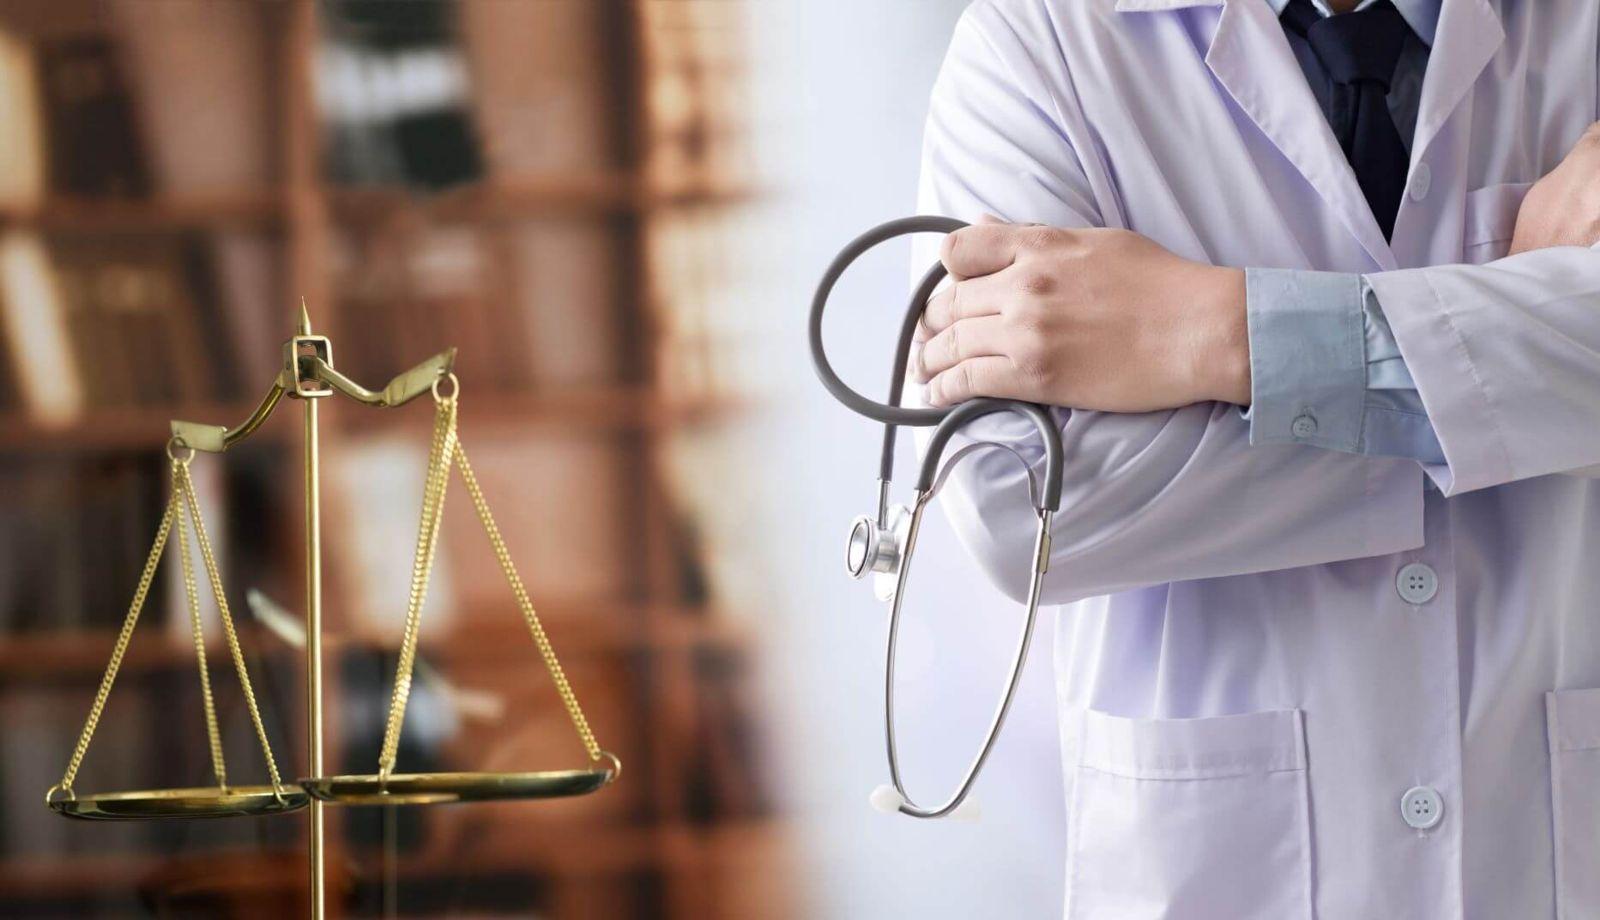 Medical Malpractice Case in DC